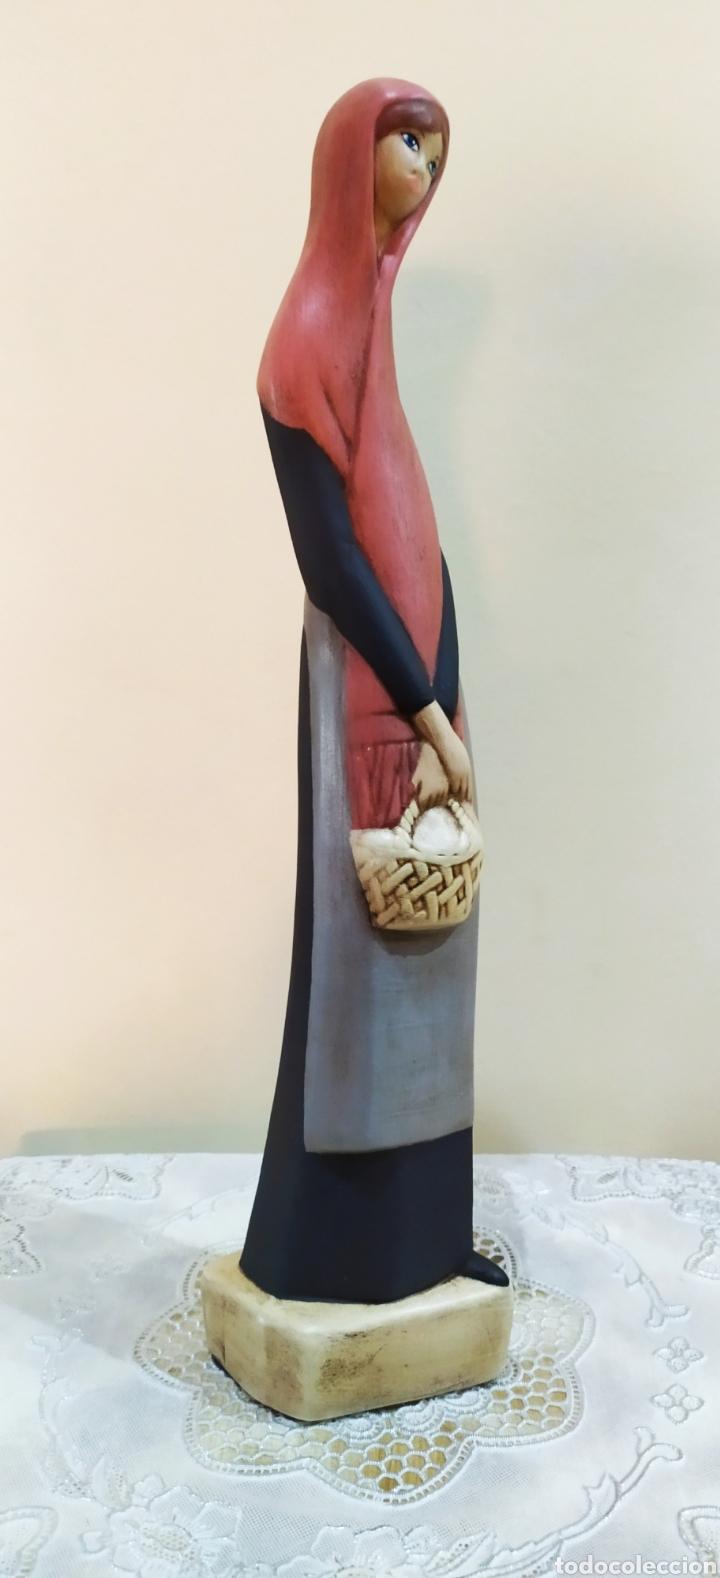 FIGURA ANTIGUA DE PORCELANA FINA EN MATE, MUJER CON VELO Y CESTA. (Arte - Escultura - Porcelana)